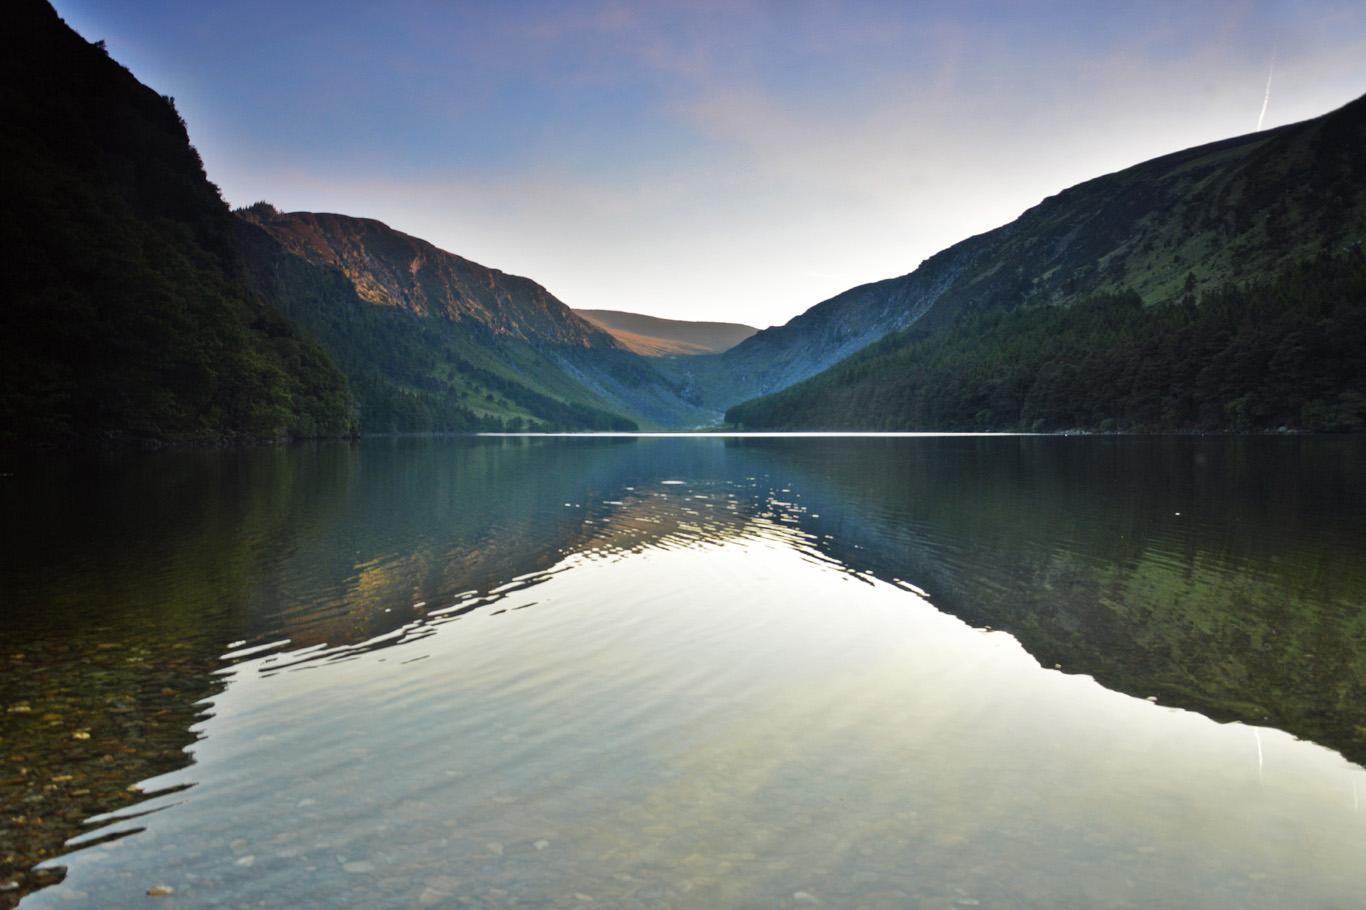 The Upper Lake at dusk